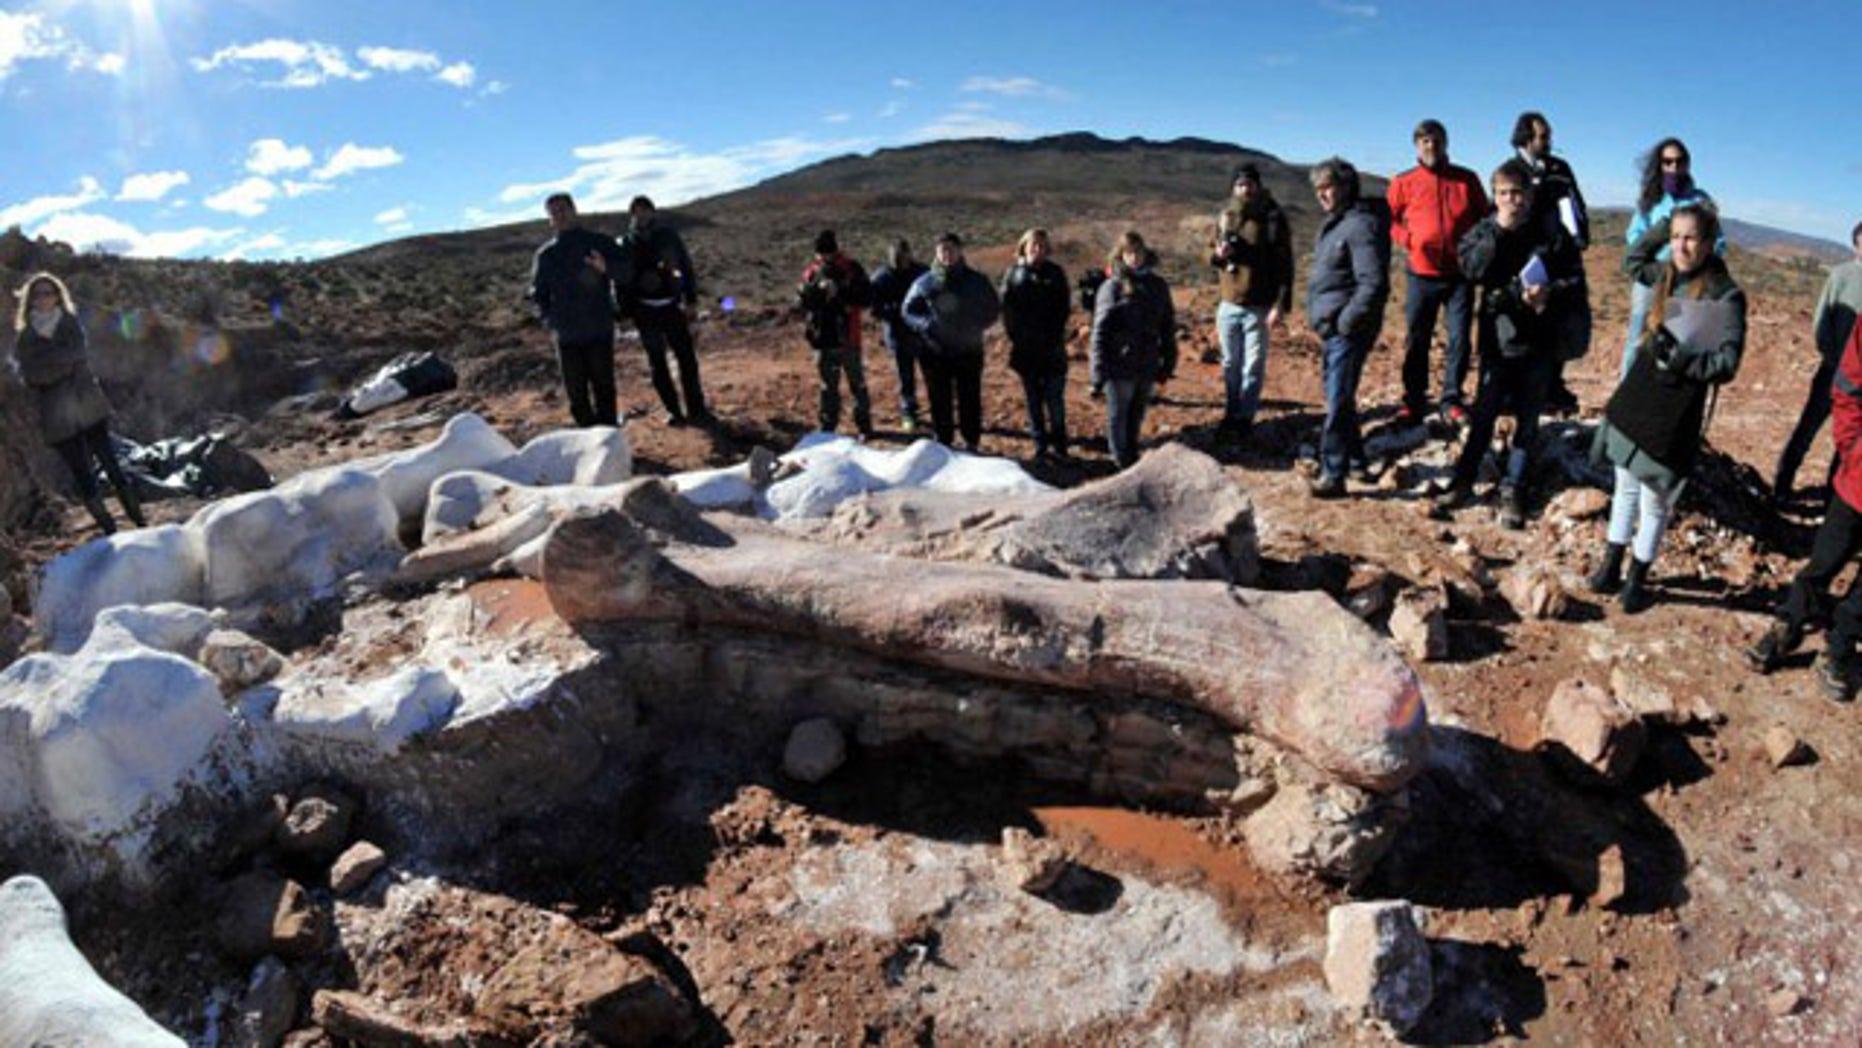 May 16, 2014: Residents and technicians look at the bones of a dinosaur at a farm in La Flecha, west of Argentina's Patagonian city of Trelew. REUTERS/Daniel Feldman